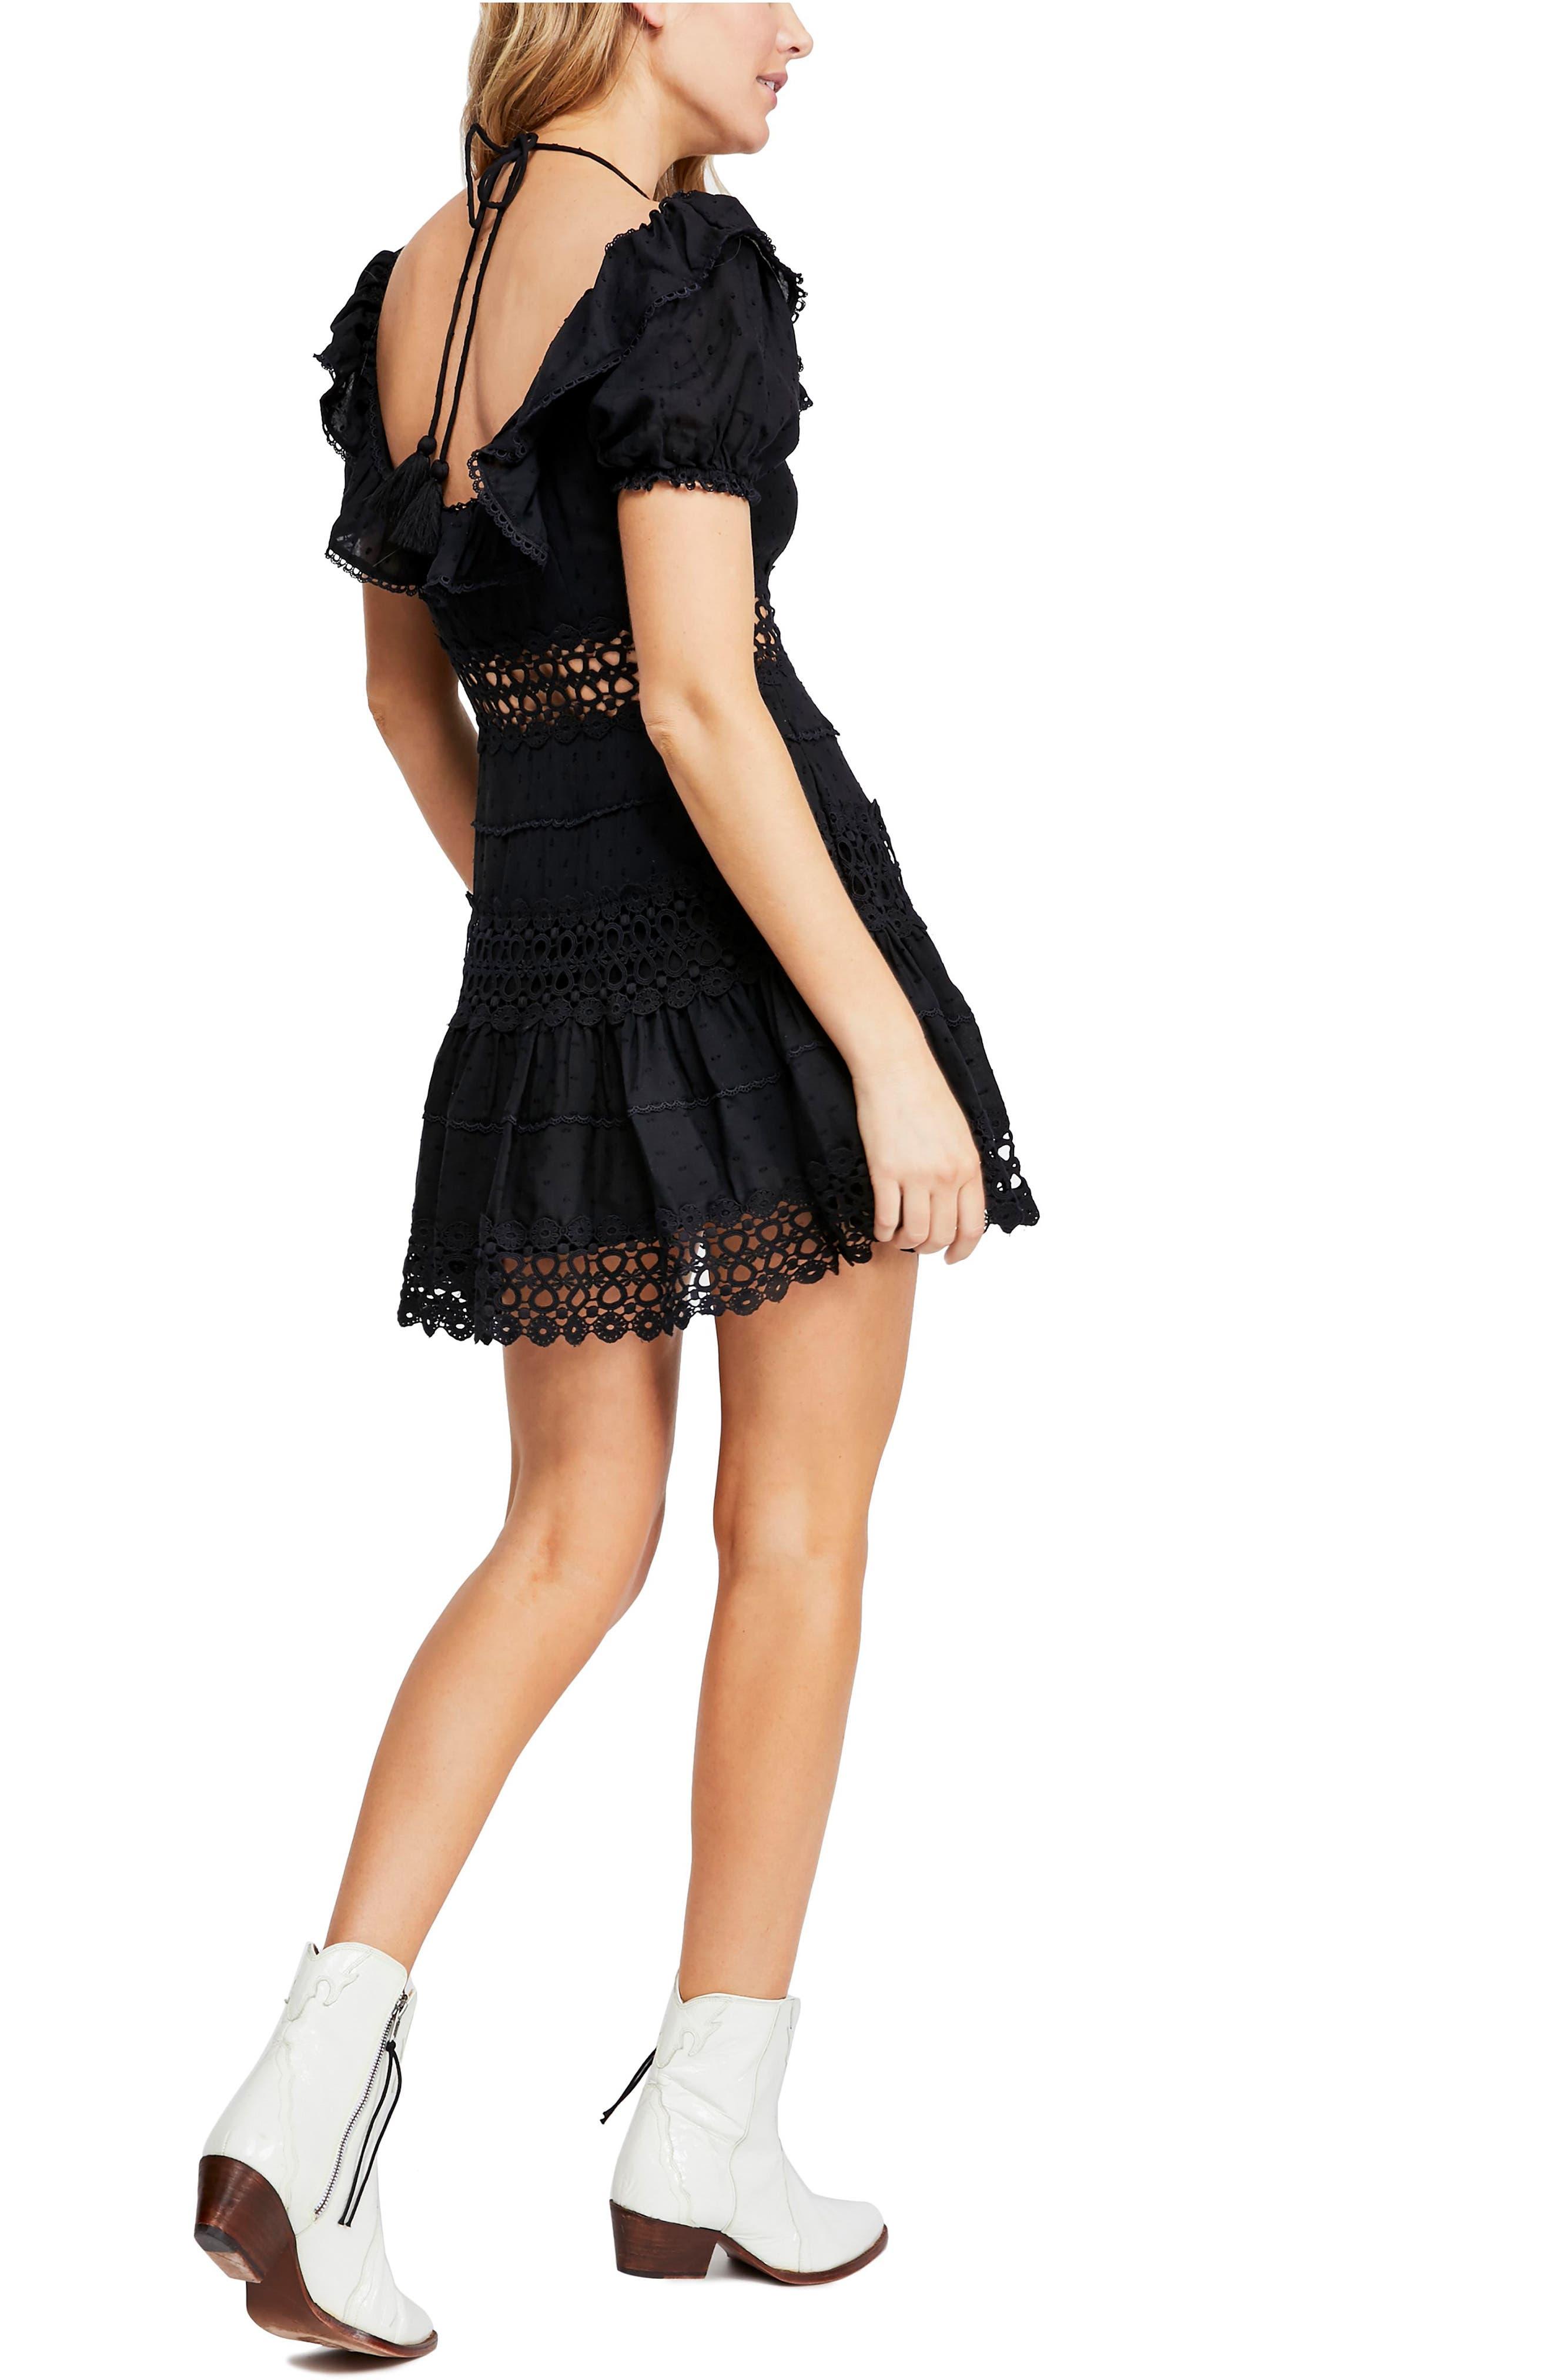 Premium-Auswahl schnell verkaufend guter Verkauf Women's New Arrivals: Clothing, Shoes & Beauty   Nordstrom